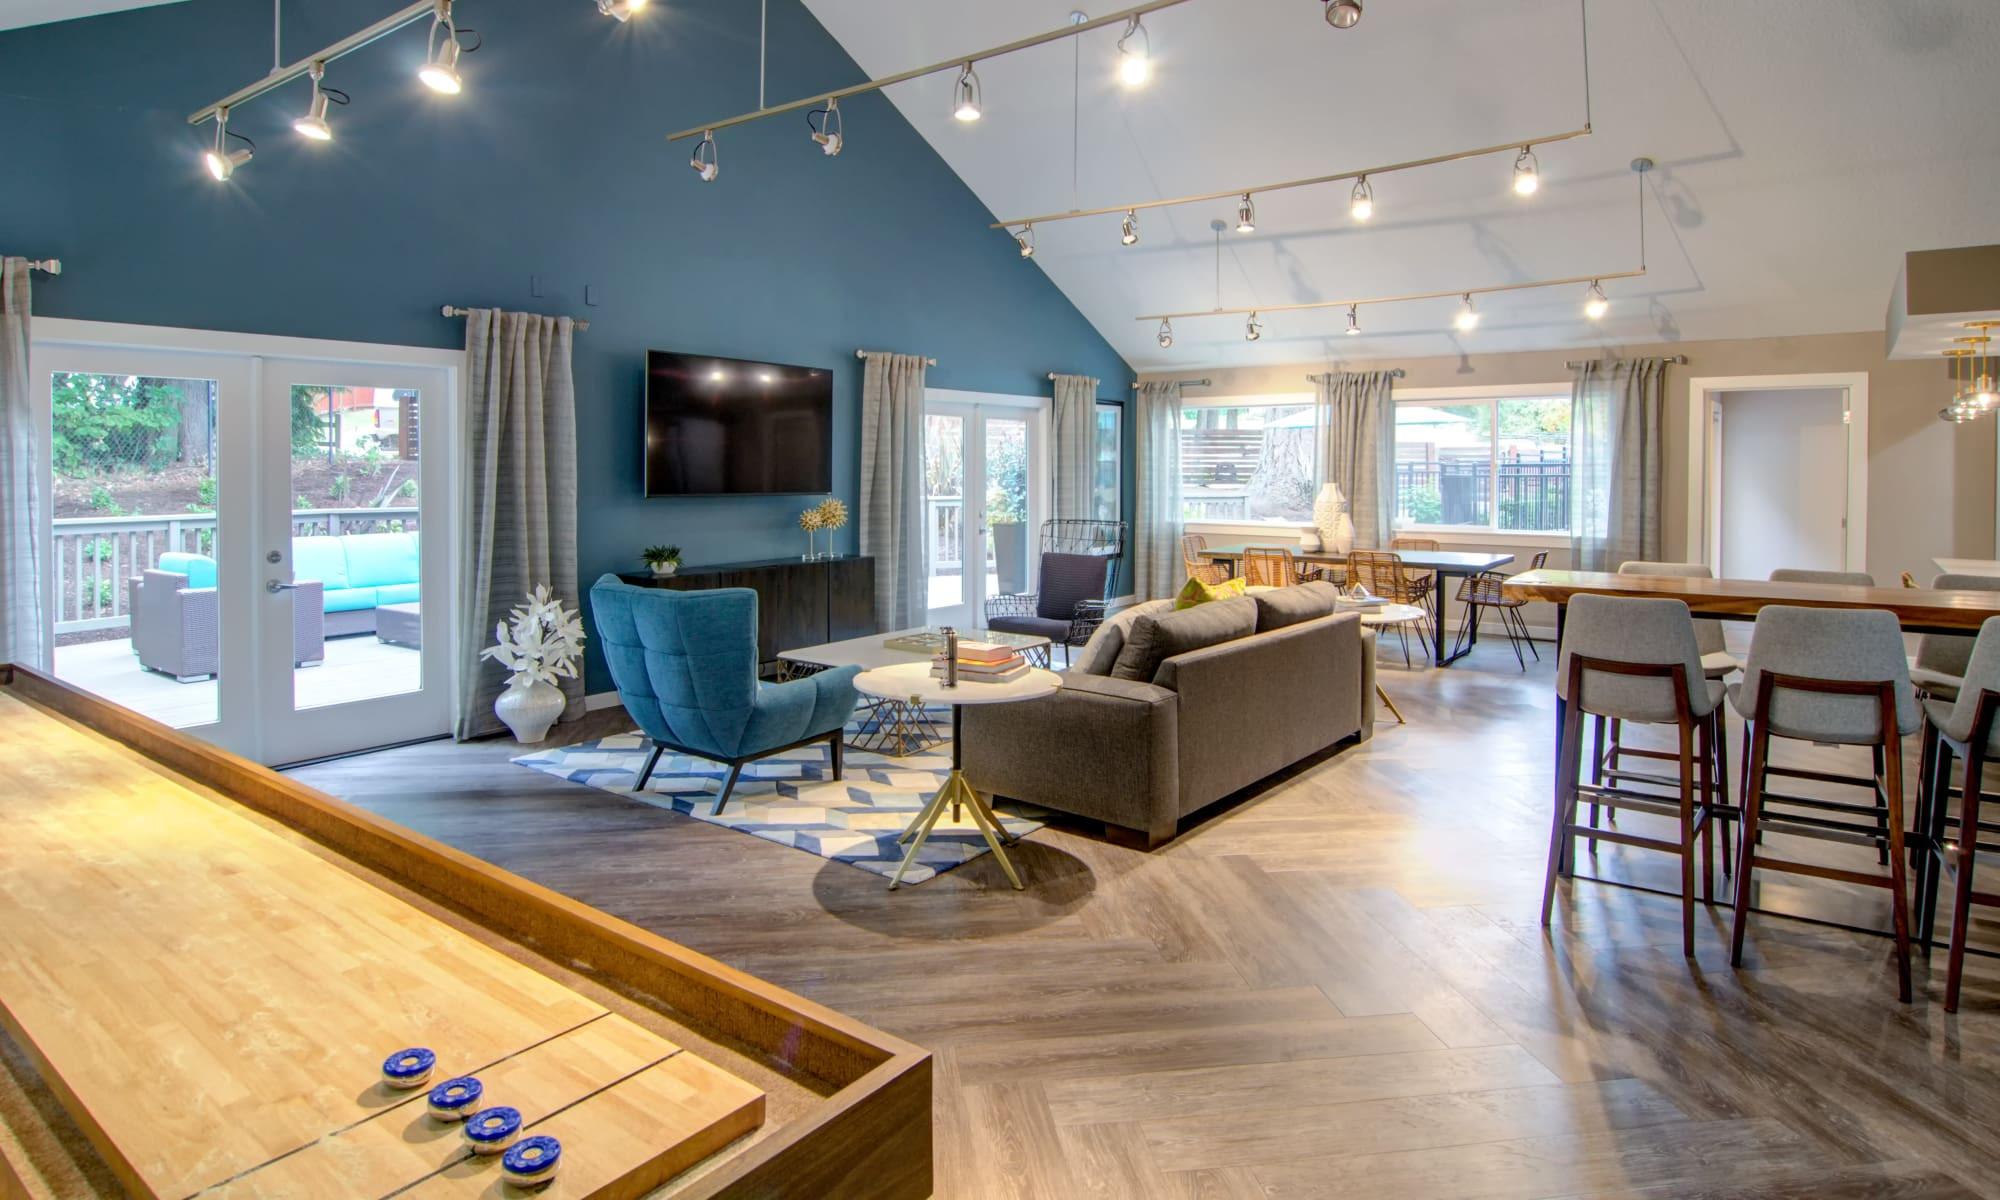 wholesale hardwood flooring portland oregon of south beaverton or apartments for rent terra murrayhill for apartments in beaverton or